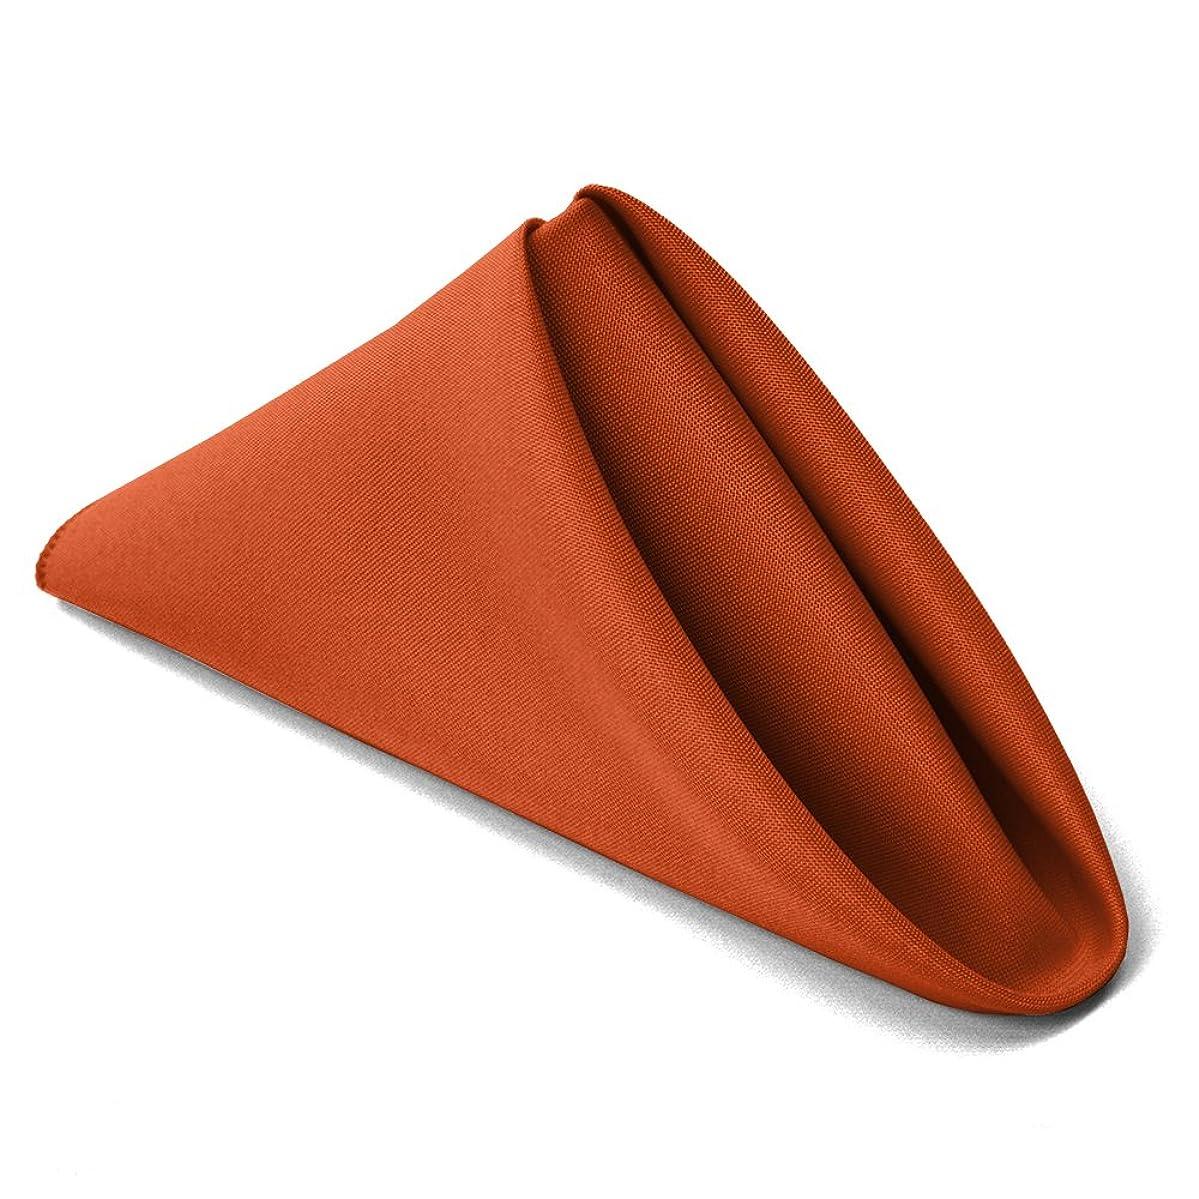 TableLinensforLess 17x17 Inch Polyester Cloth Napkins, Set of 6 (Burnt Orange)